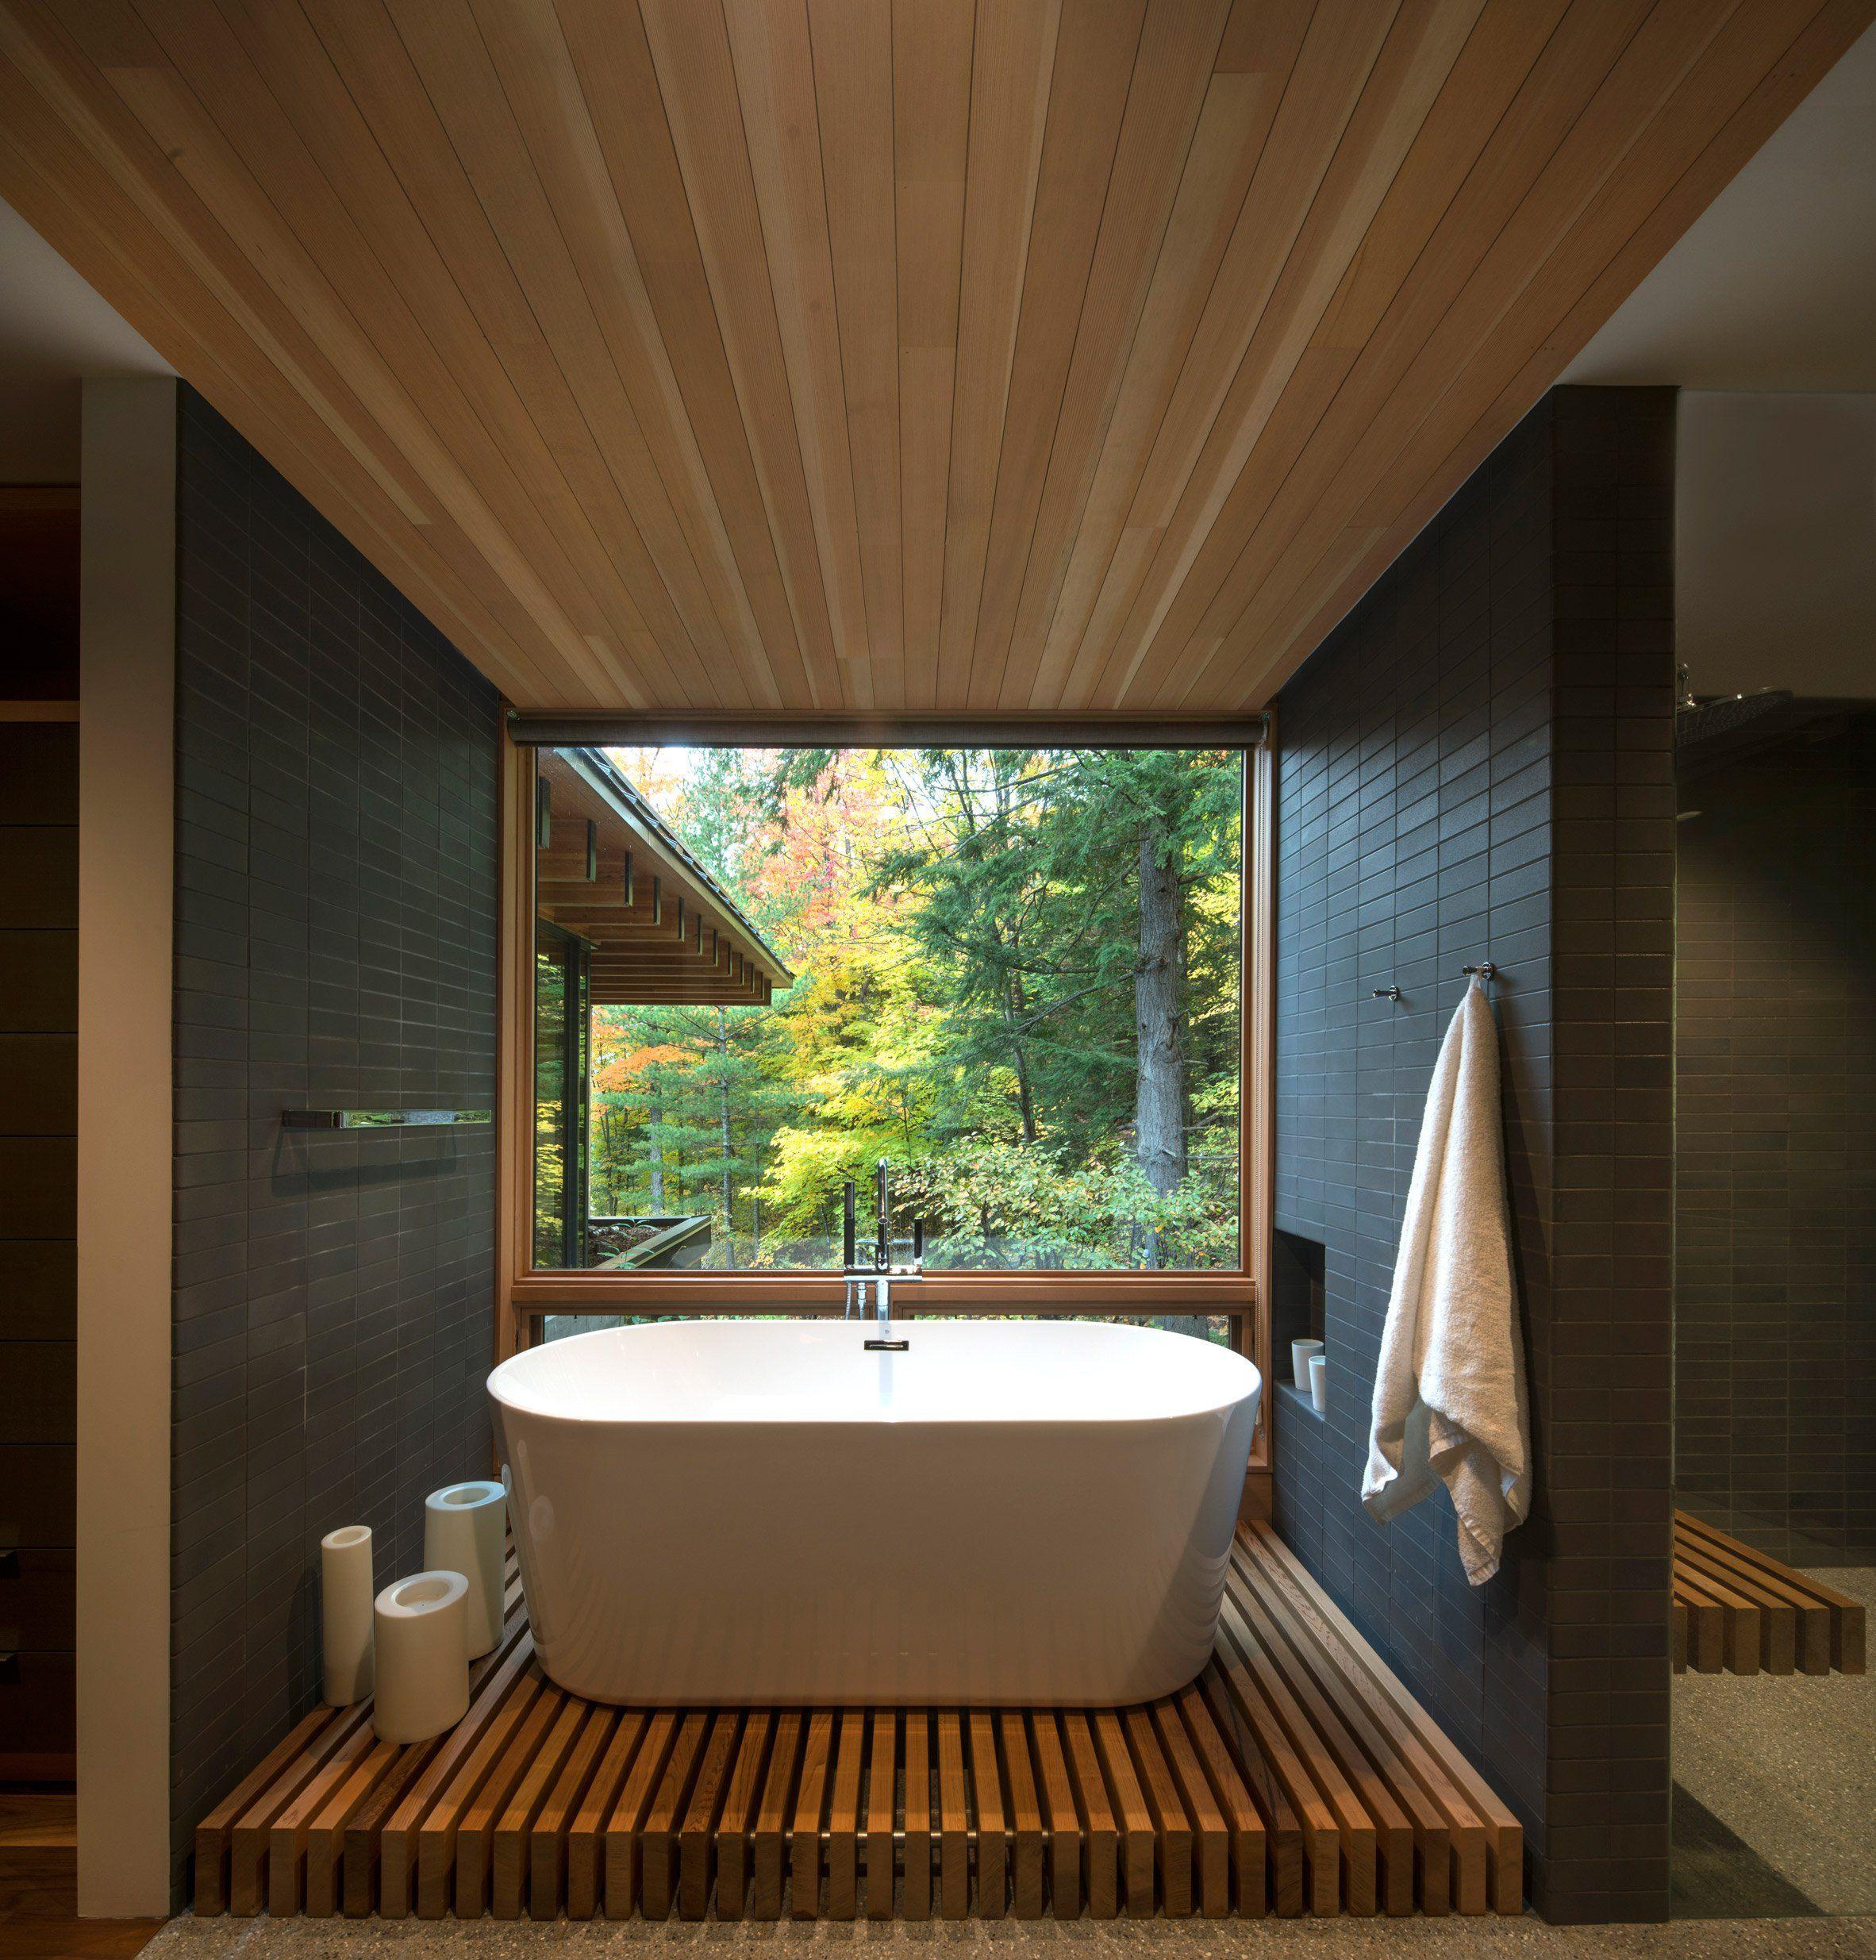 Pin By Stephanie Gleeson On Toiletd: Bohlin Cywinski Jackson Creates Remote Holiday Retreat In